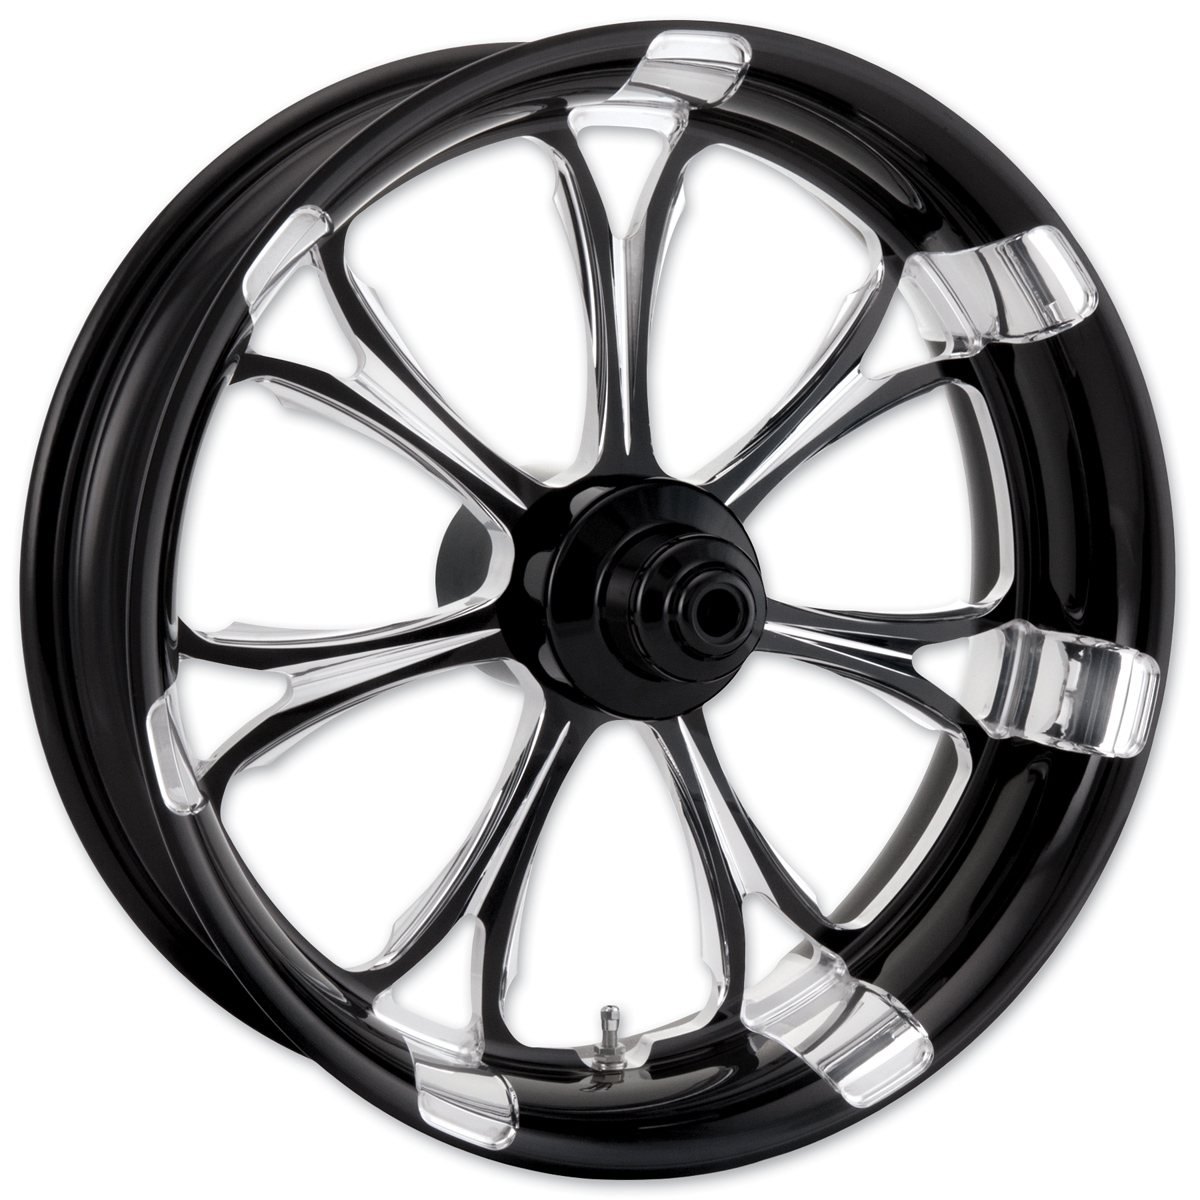 Performance Machine Paramount Chrome Rear Wheel, 18